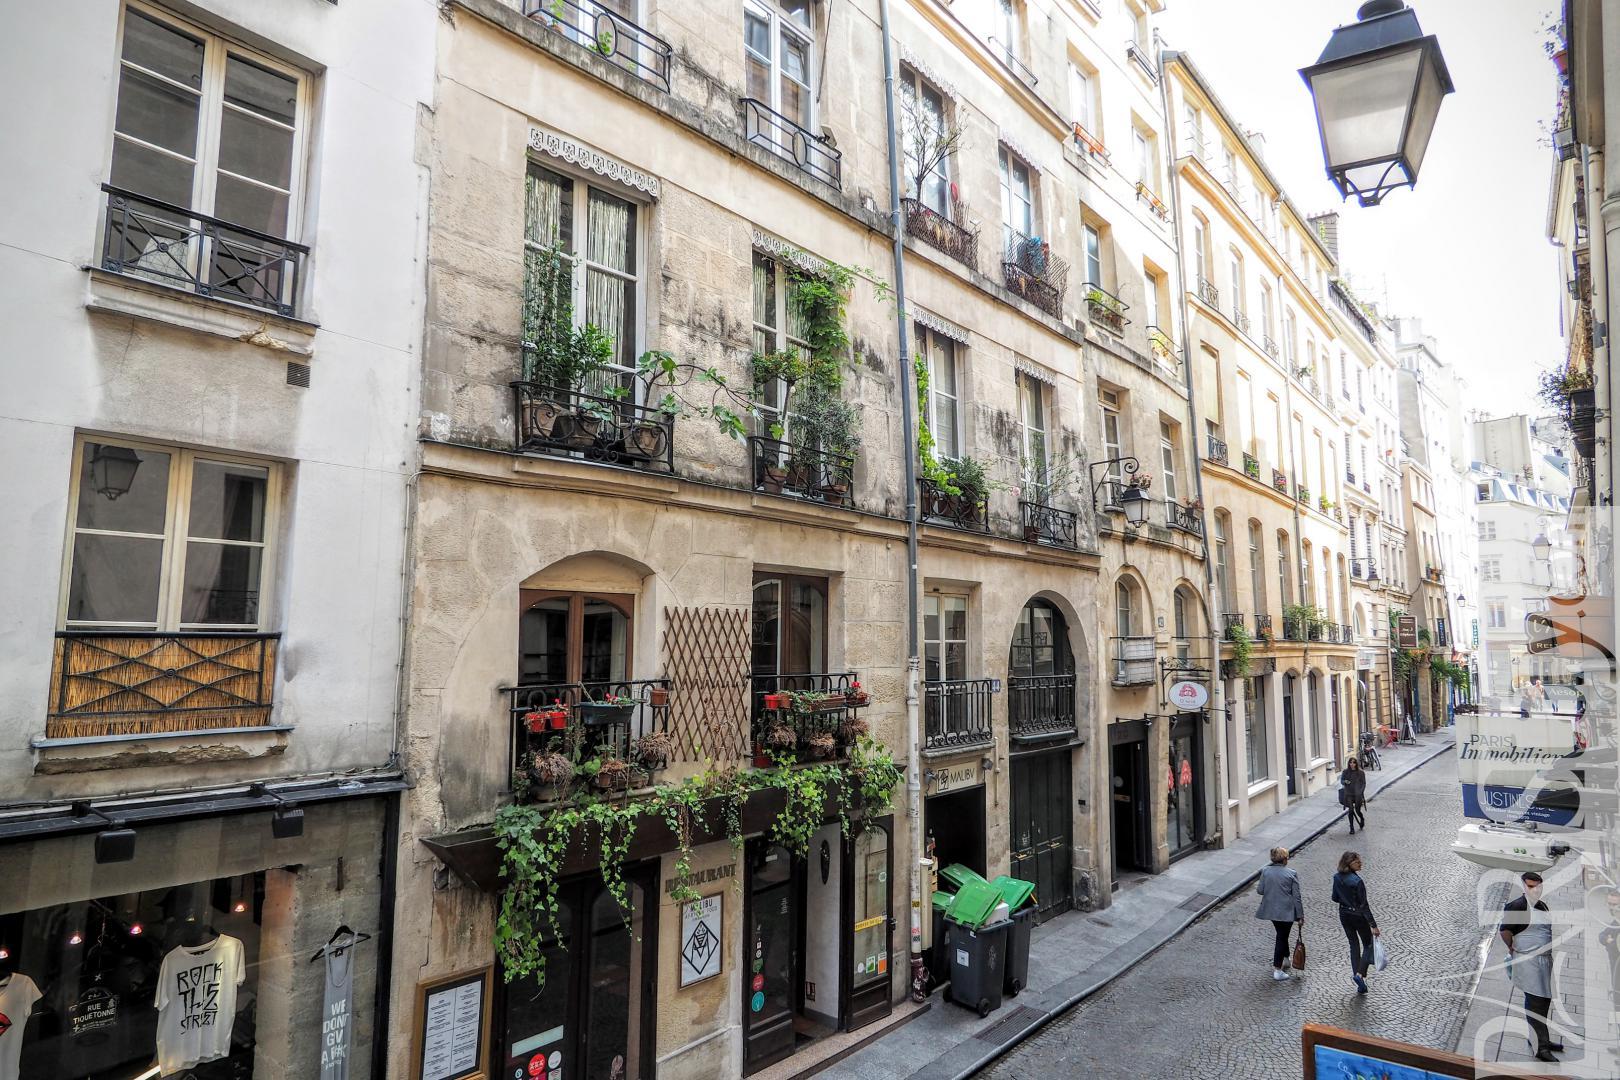 Apartment for rent in paris one bedroom terrace Montorgueil